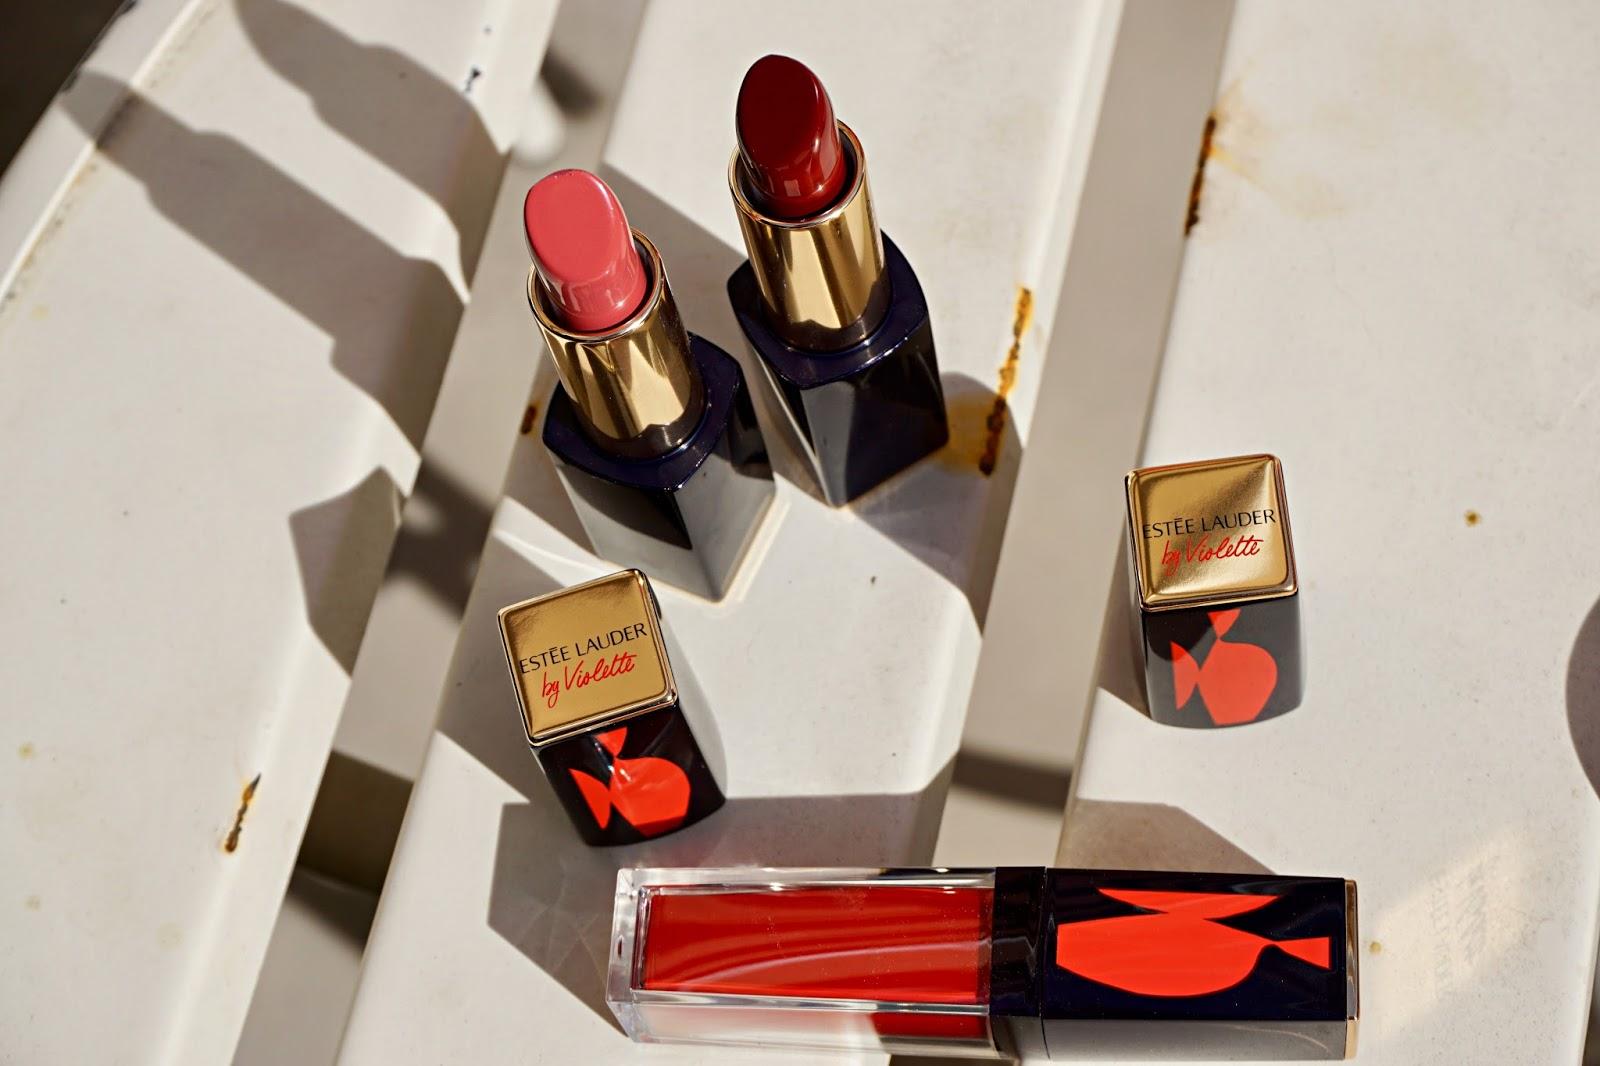 estee lauder by violette lipstick swatches